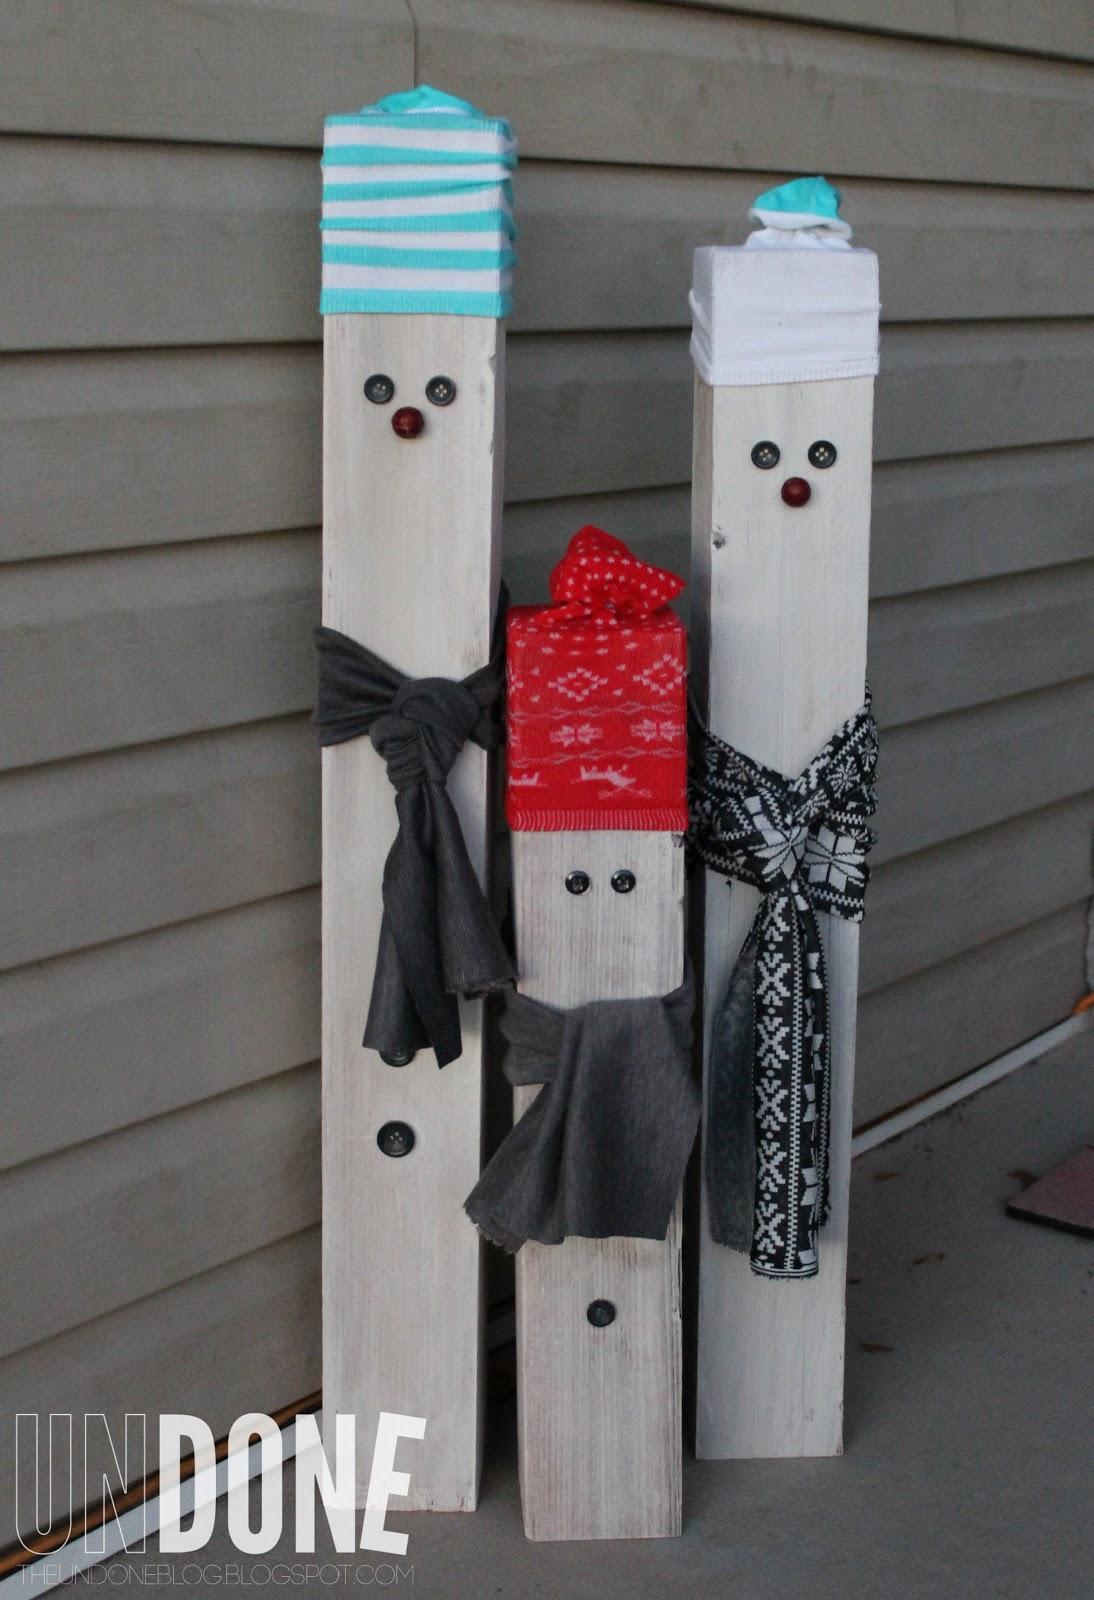 Undone fence post snowmen practicing pinterest for Decoration 4x4